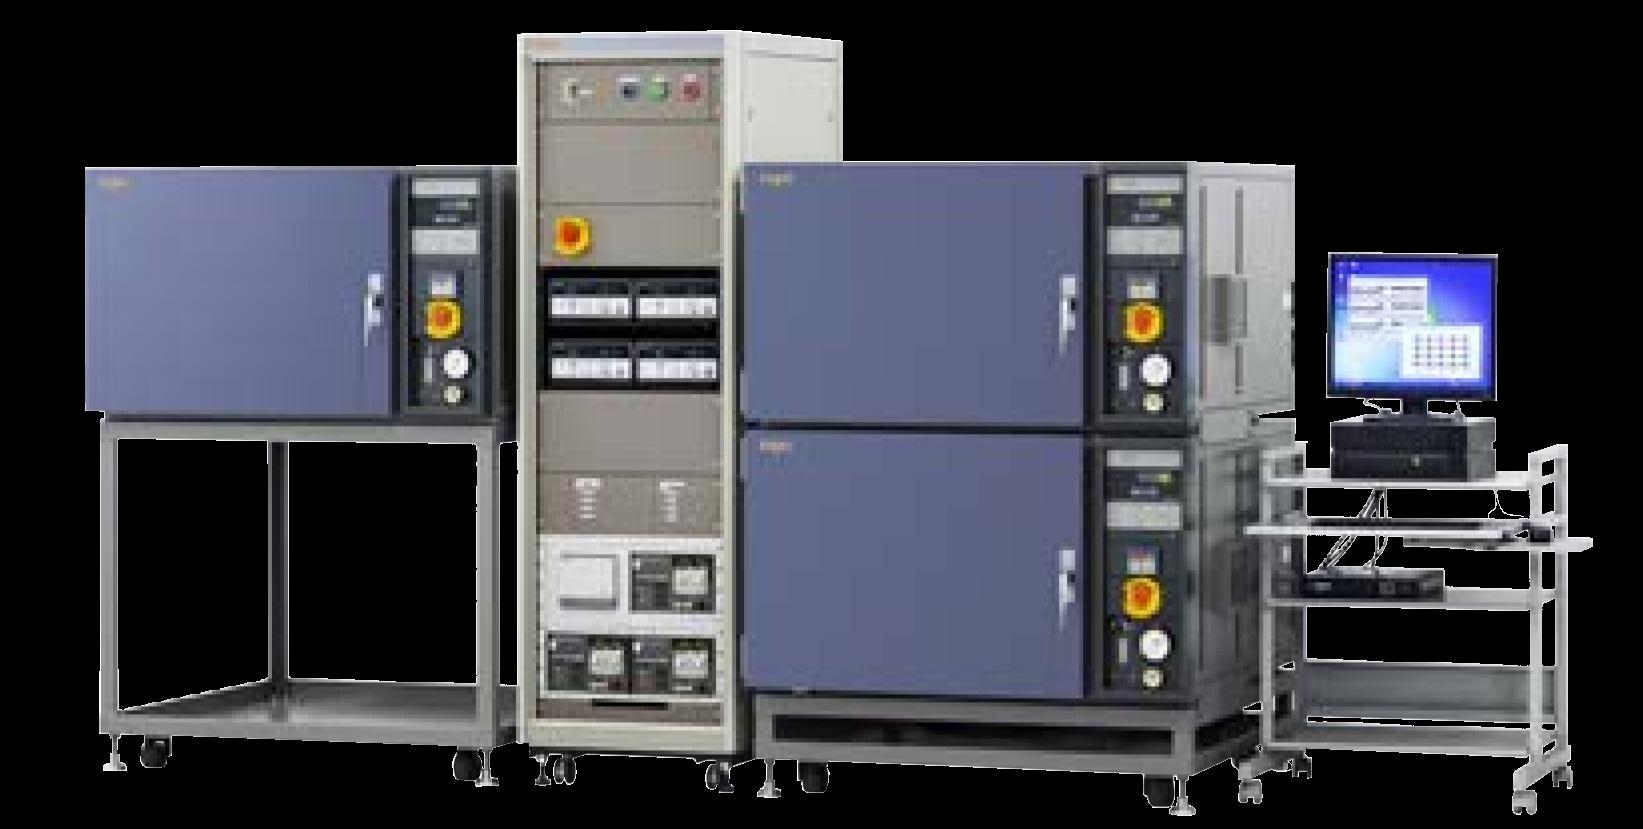 Electromigration inductor evaluation